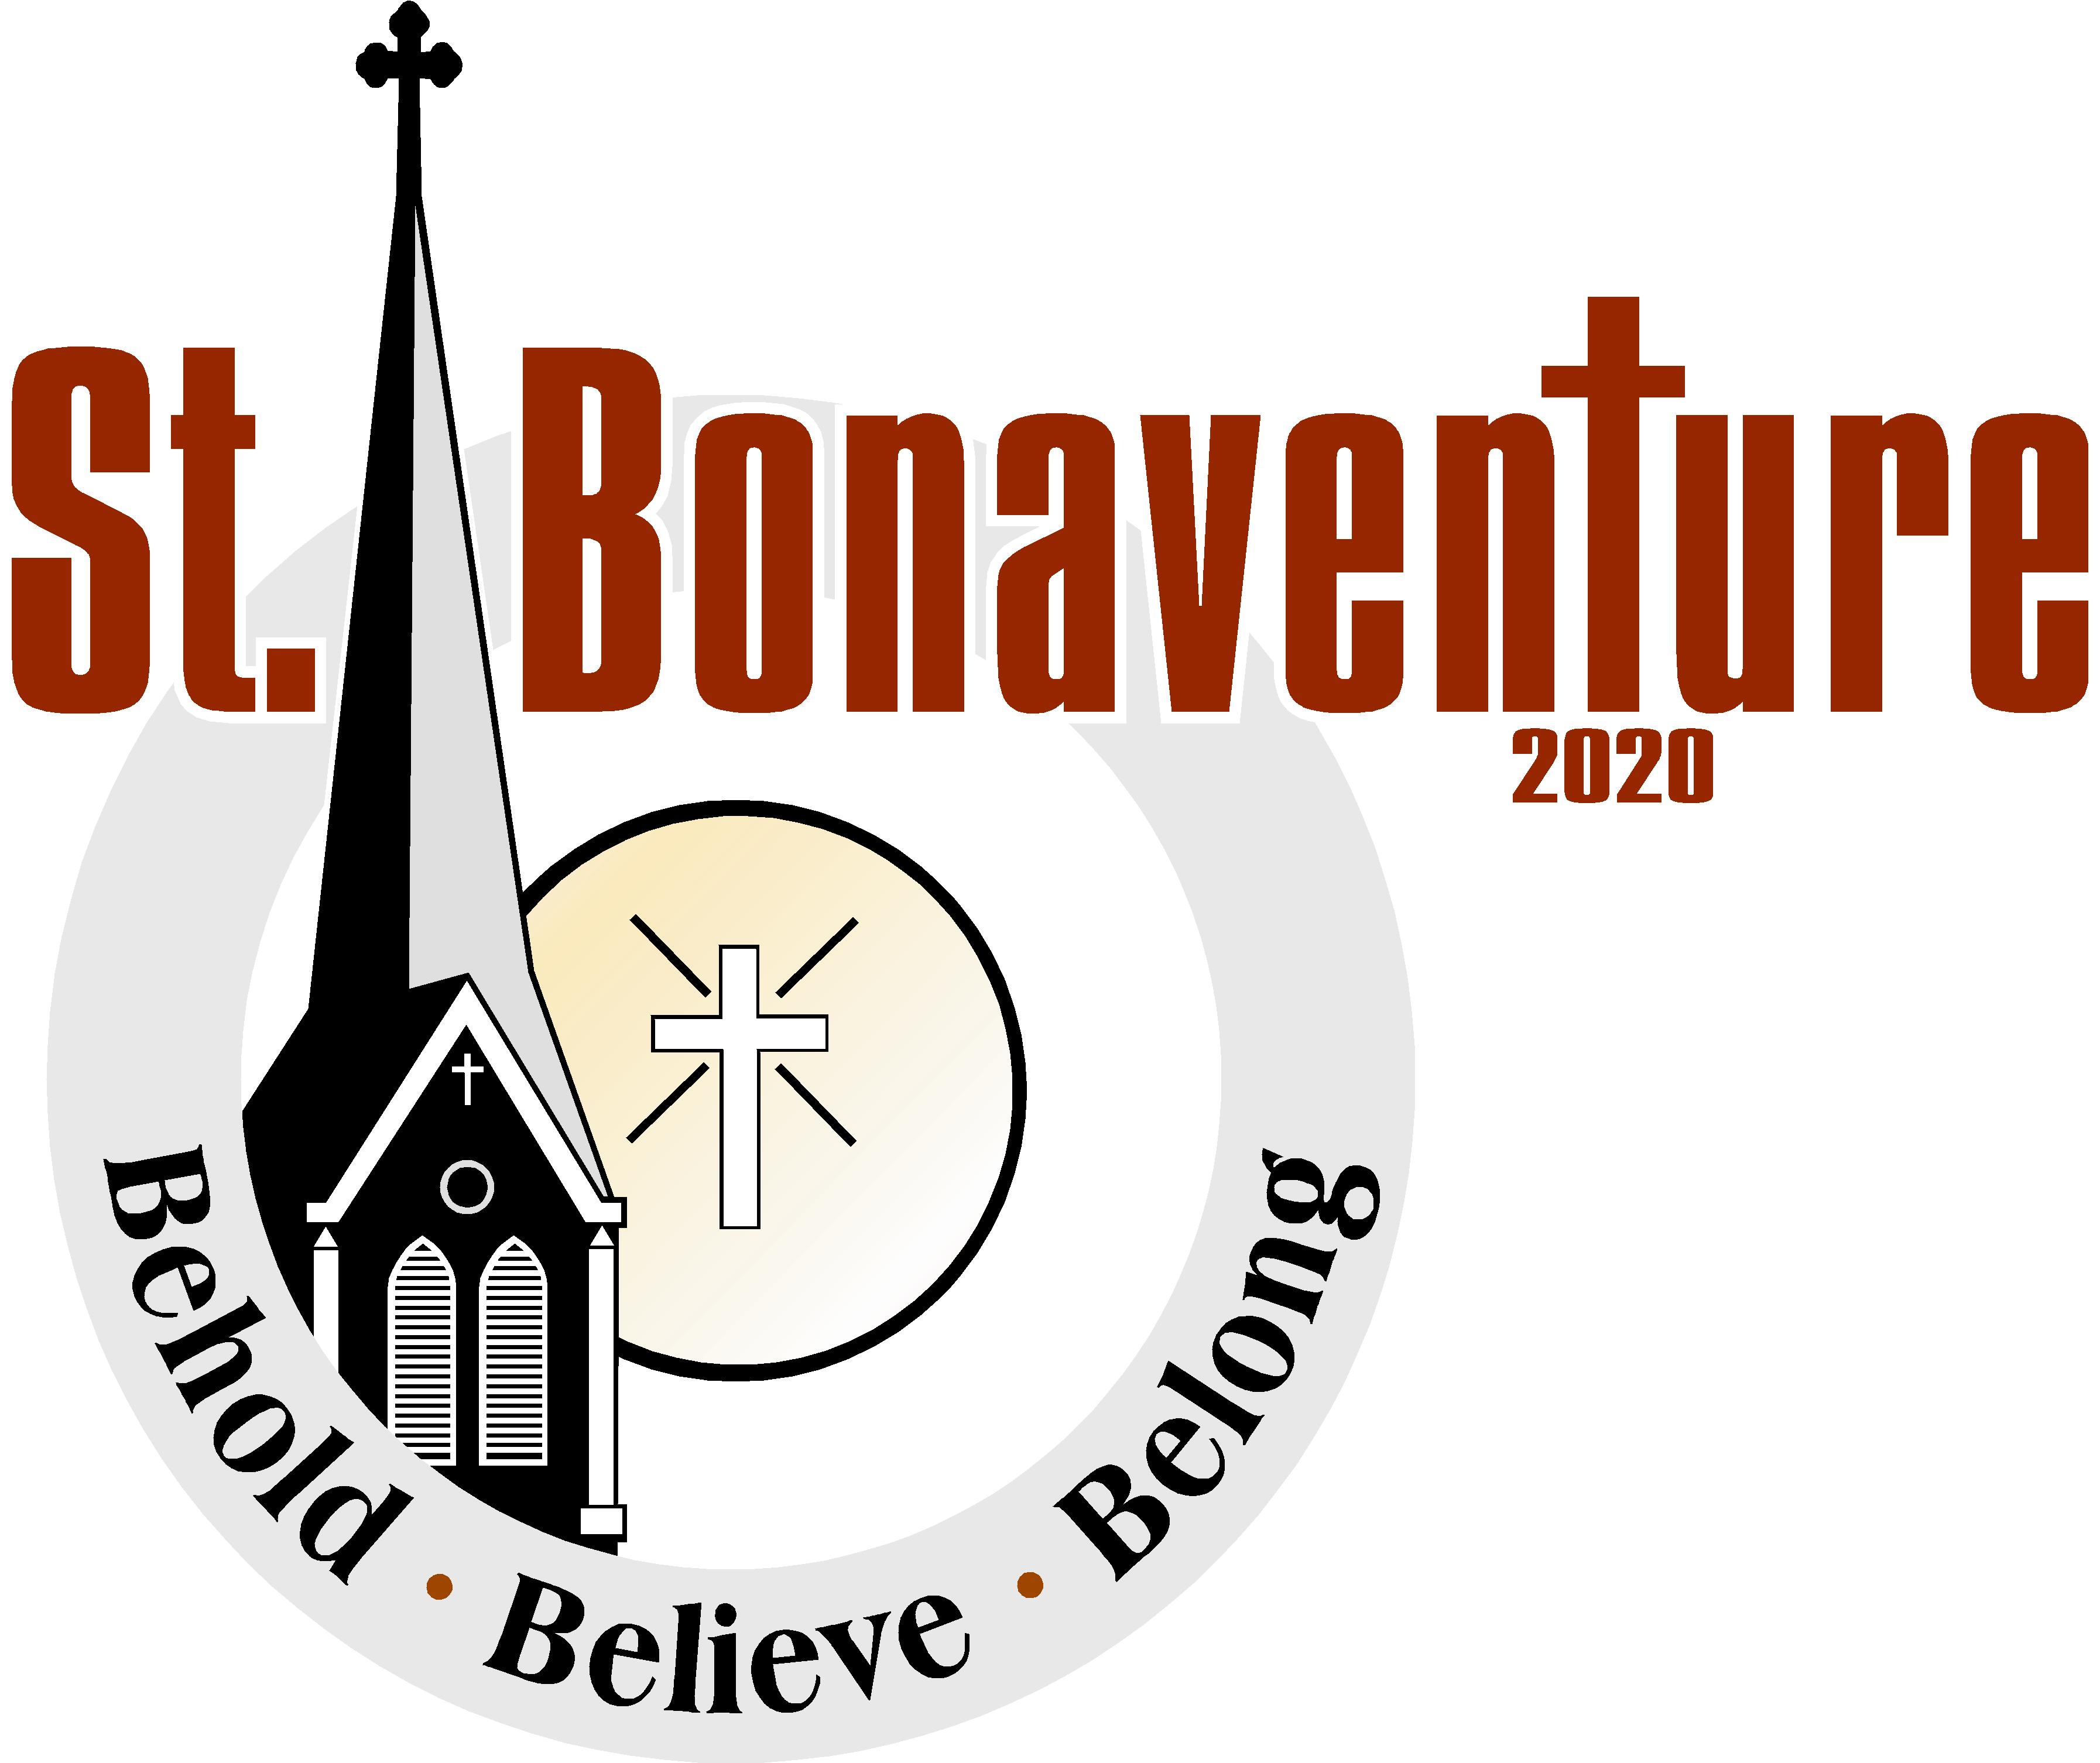 Religious money prize clipart vector black and white stock Parish Bulletins - Saint Bonaventure Catholic Church vector black and white stock